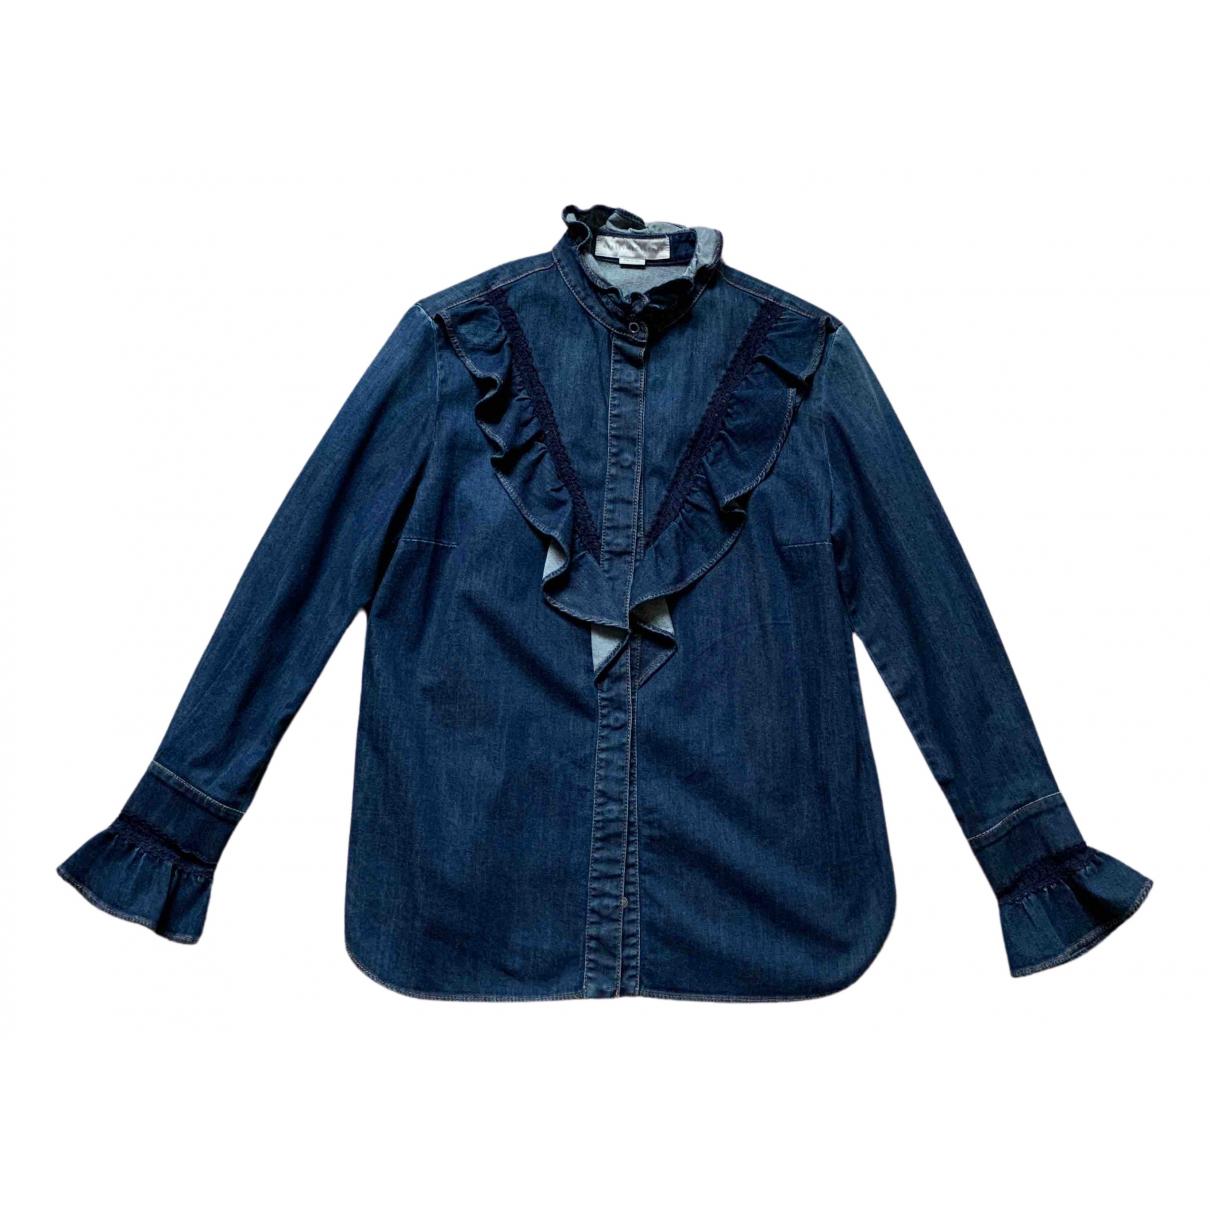 Stella Mccartney - Top   pour femme en denim - bleu